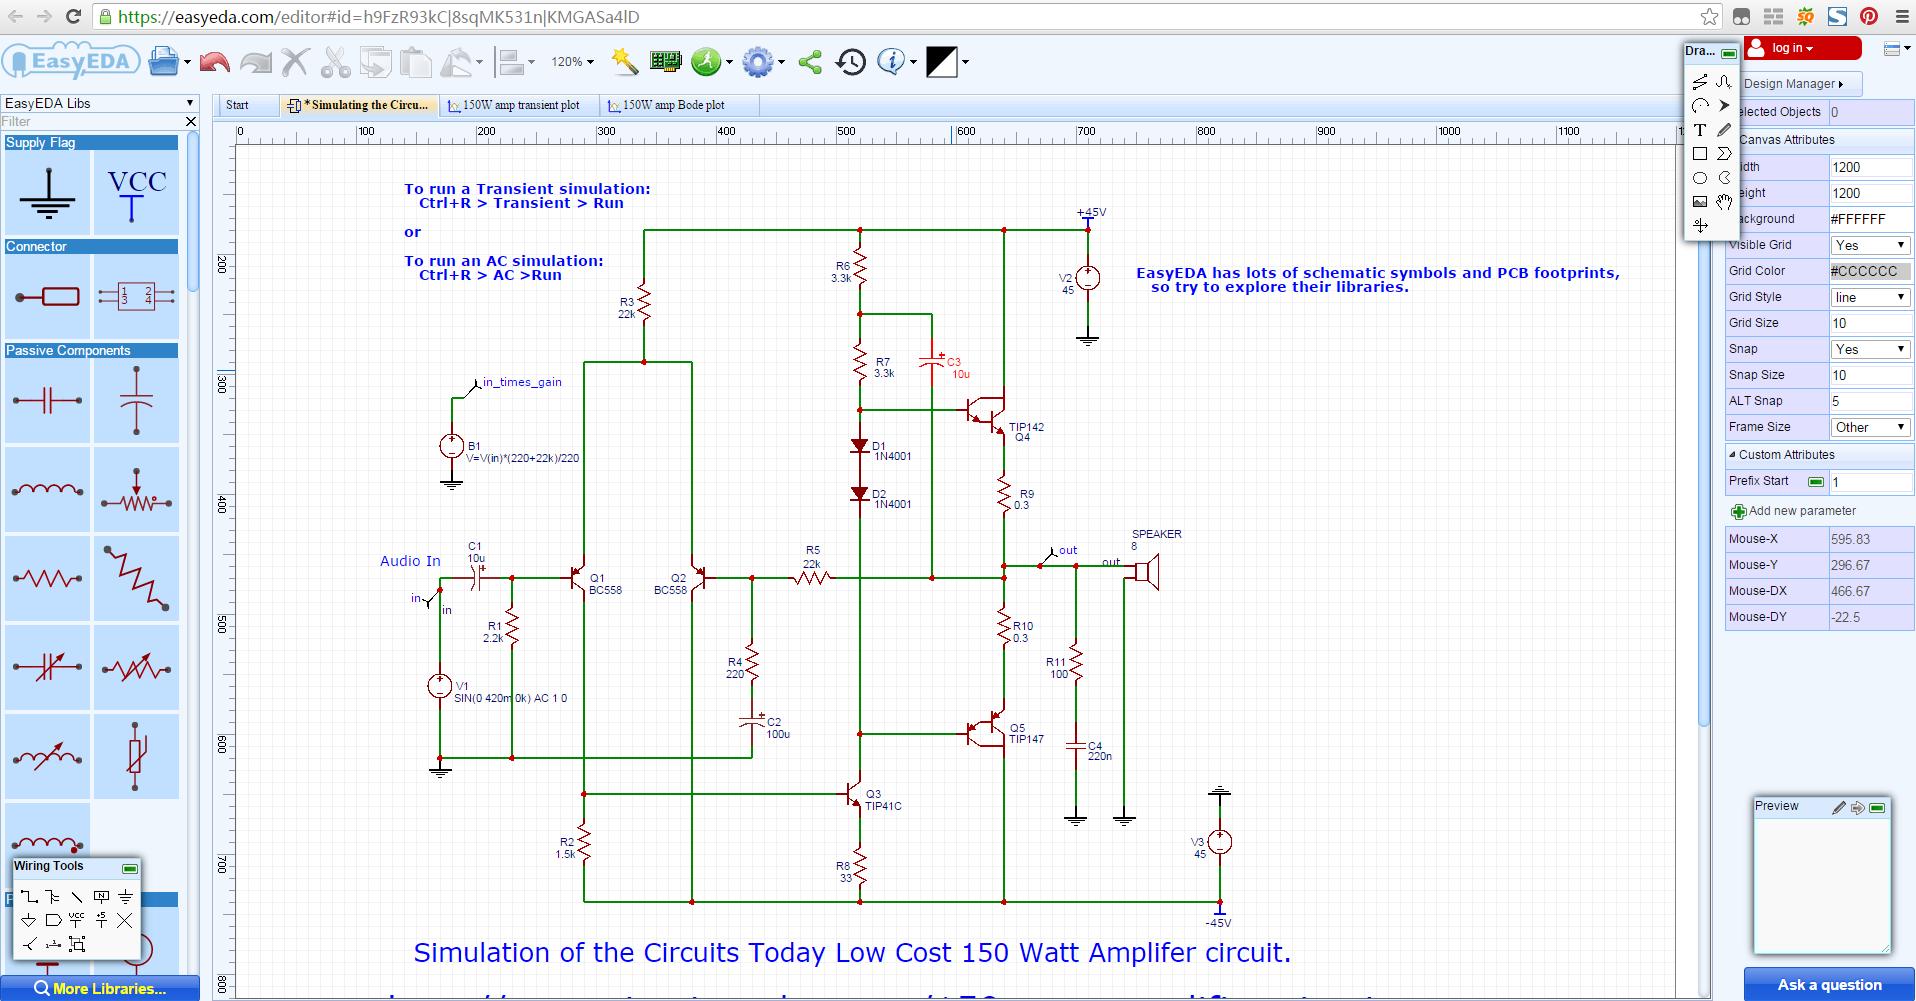 Schemi Elettrici Per Trenini : Sistema dali schemi elettrici mobili lavelli urmet schema